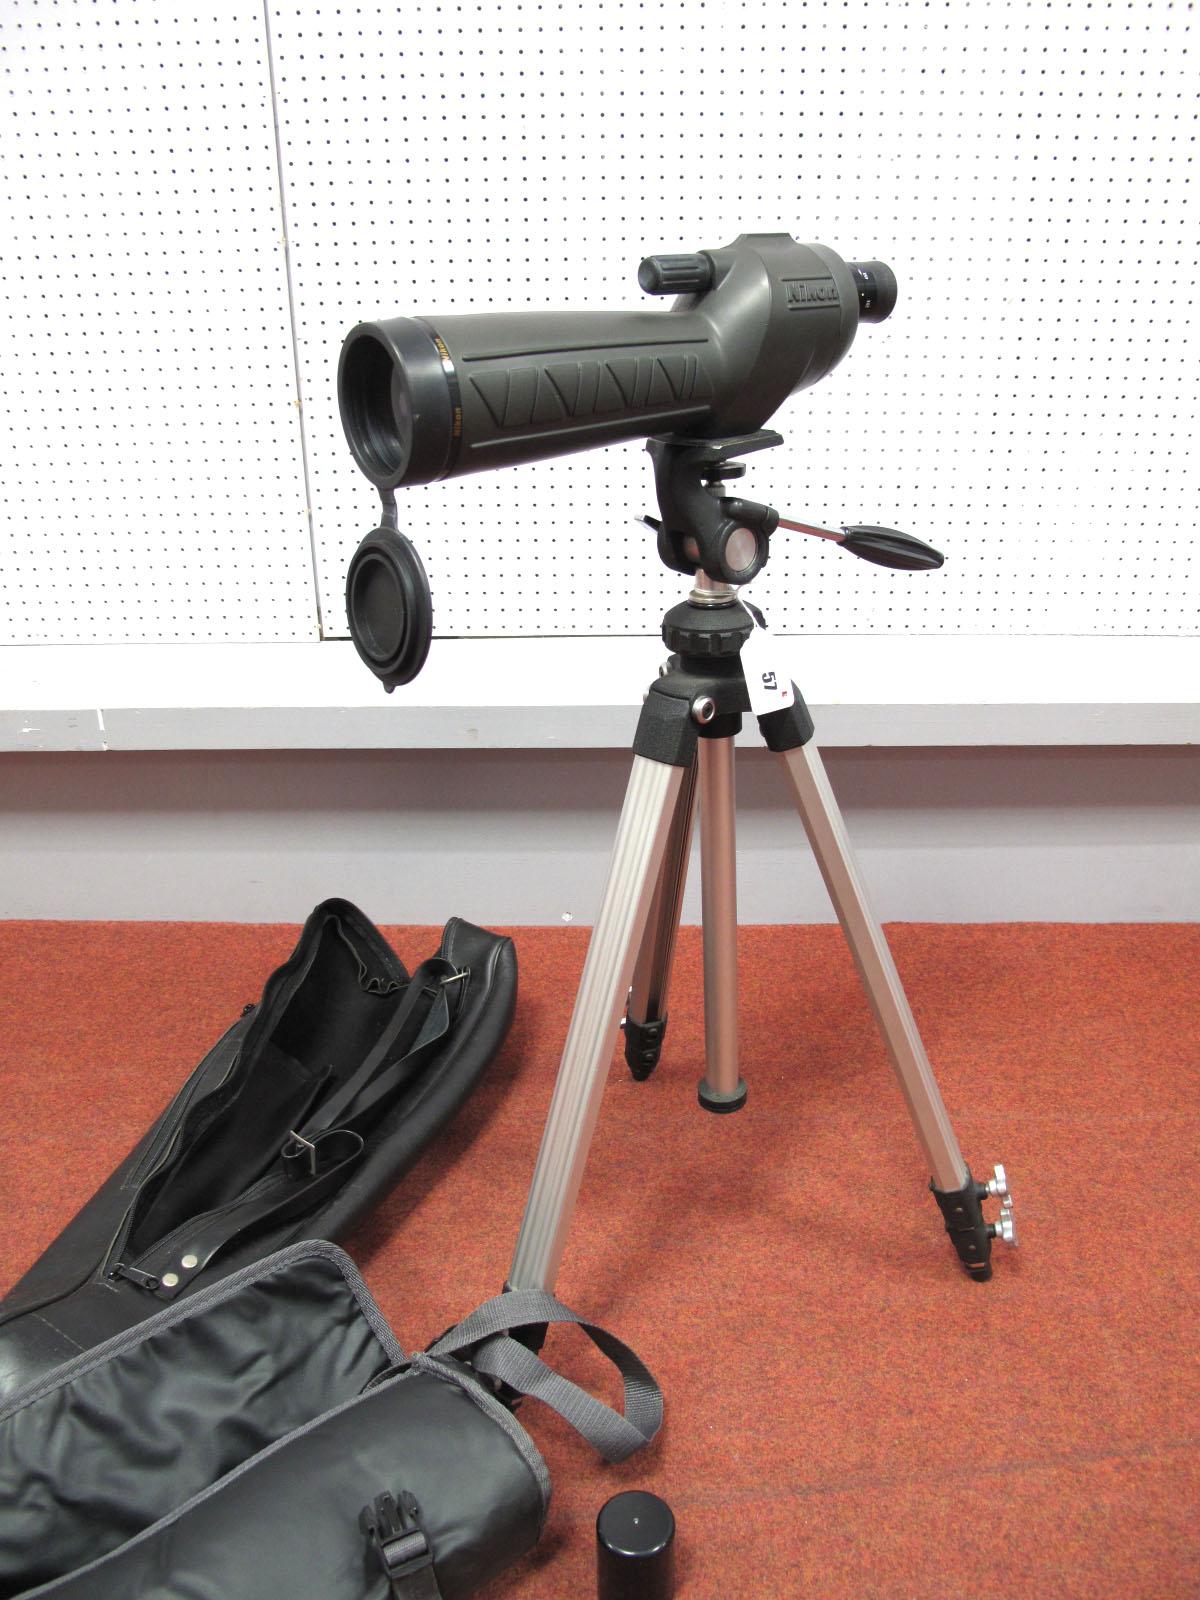 Nikon Scope 15-45, in bag, plus tripod stand and bag.